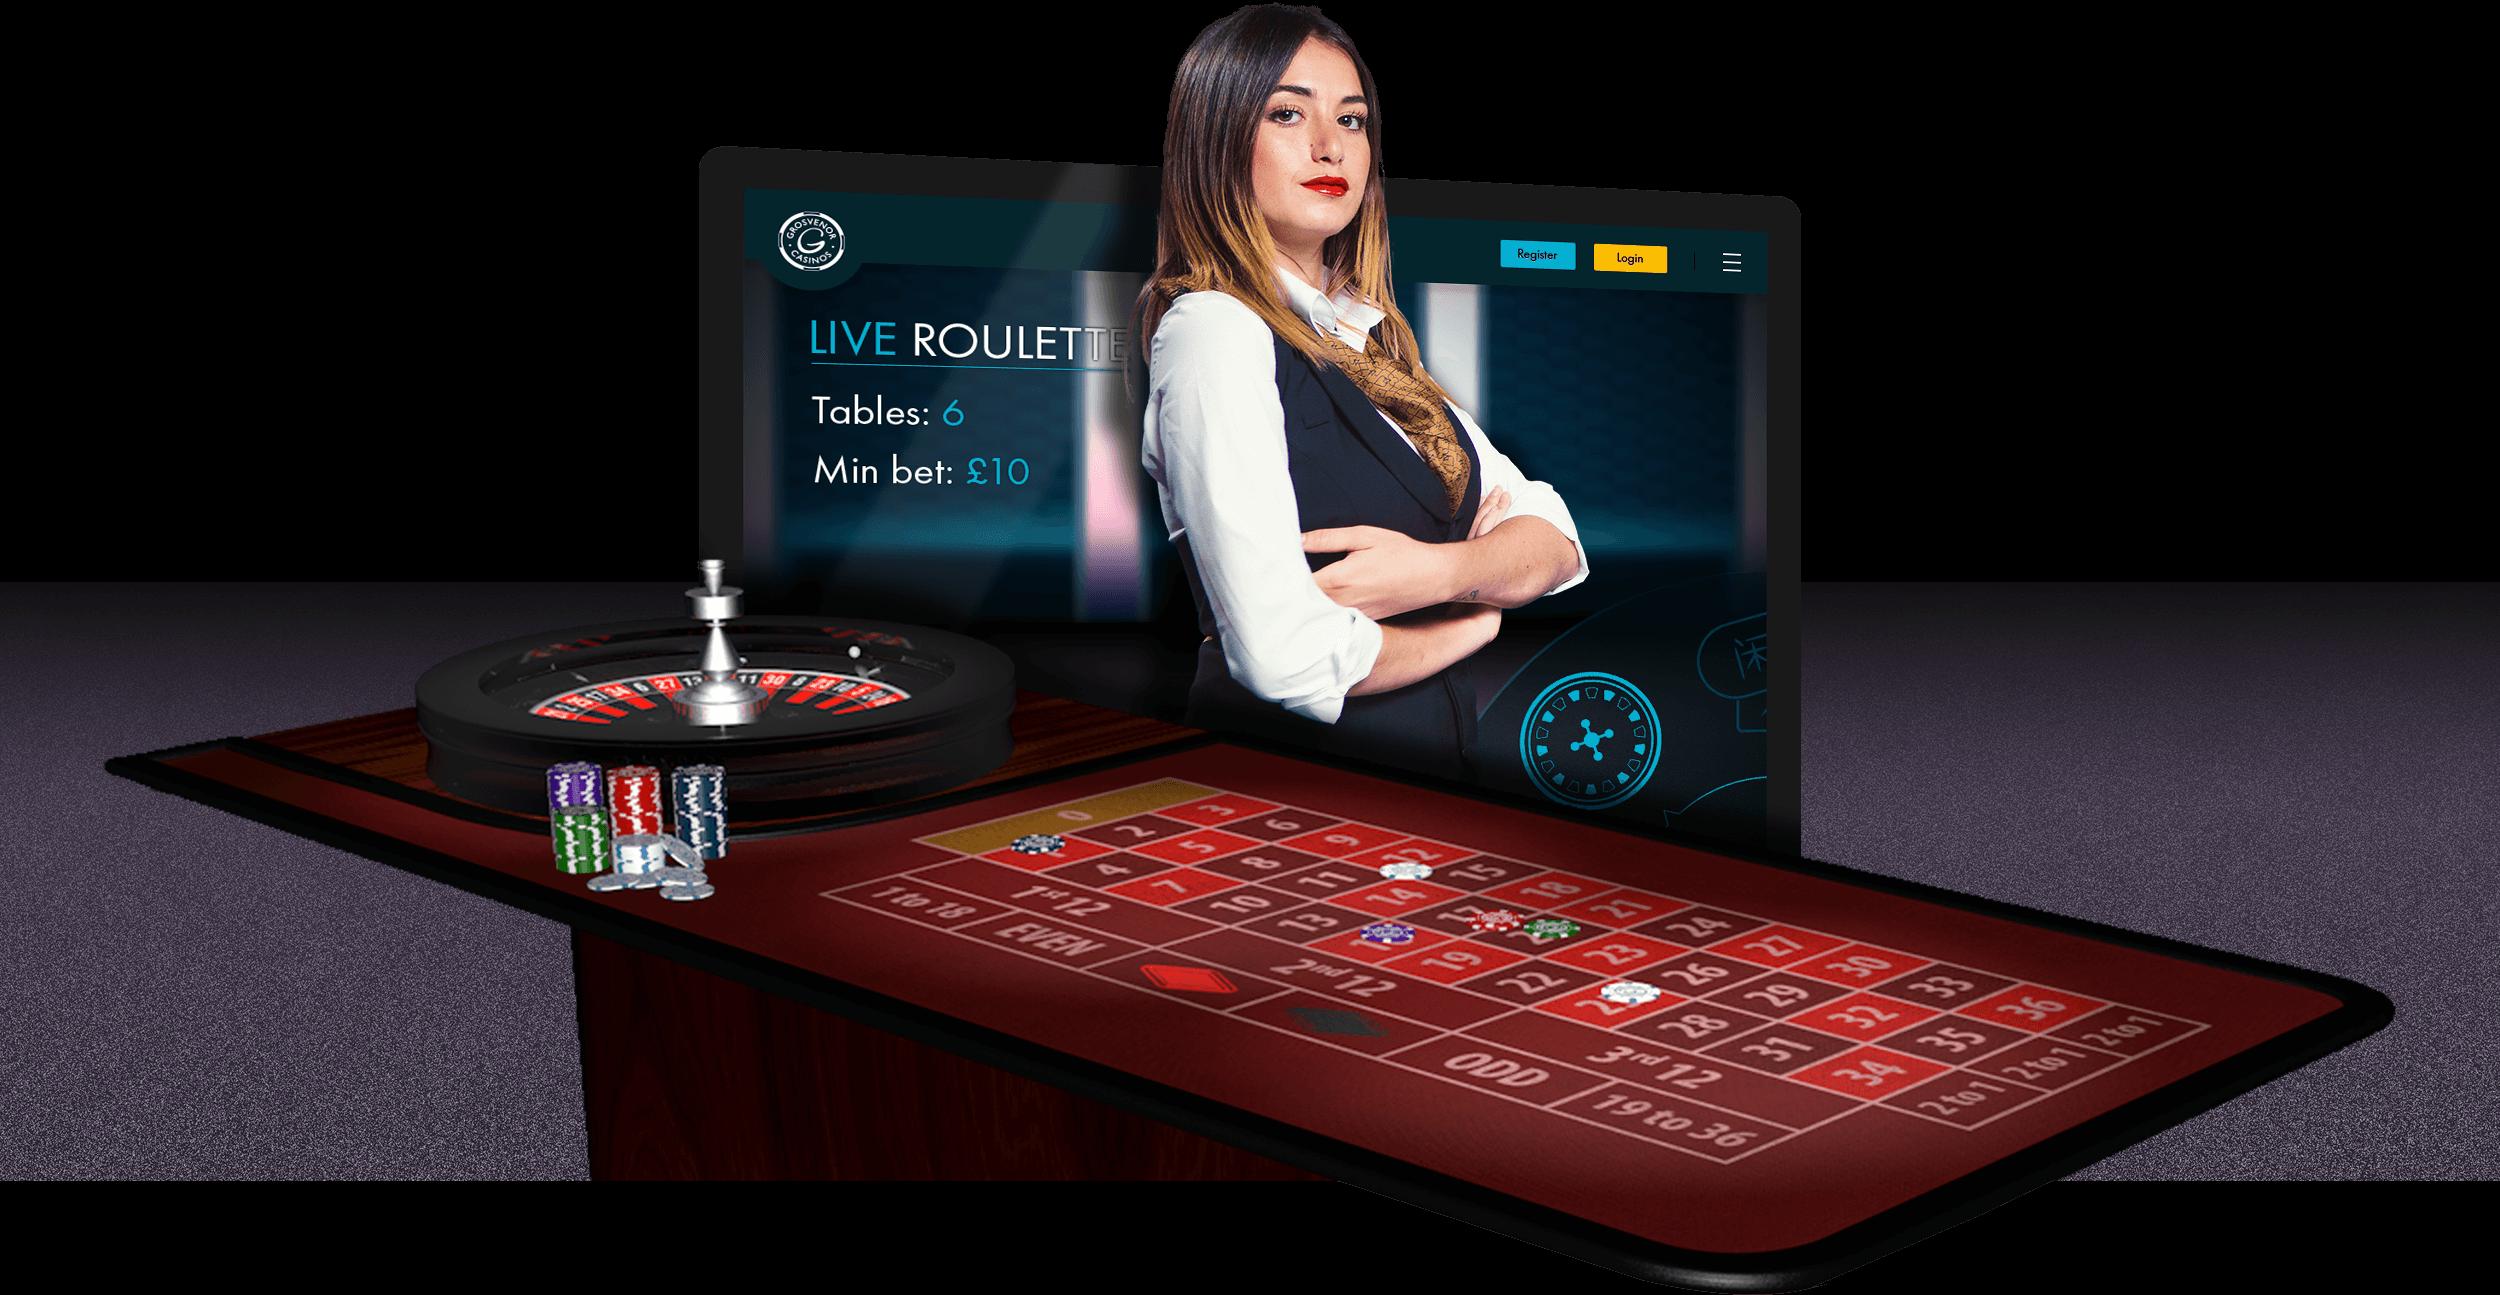 Provider Casino Online Terbaik